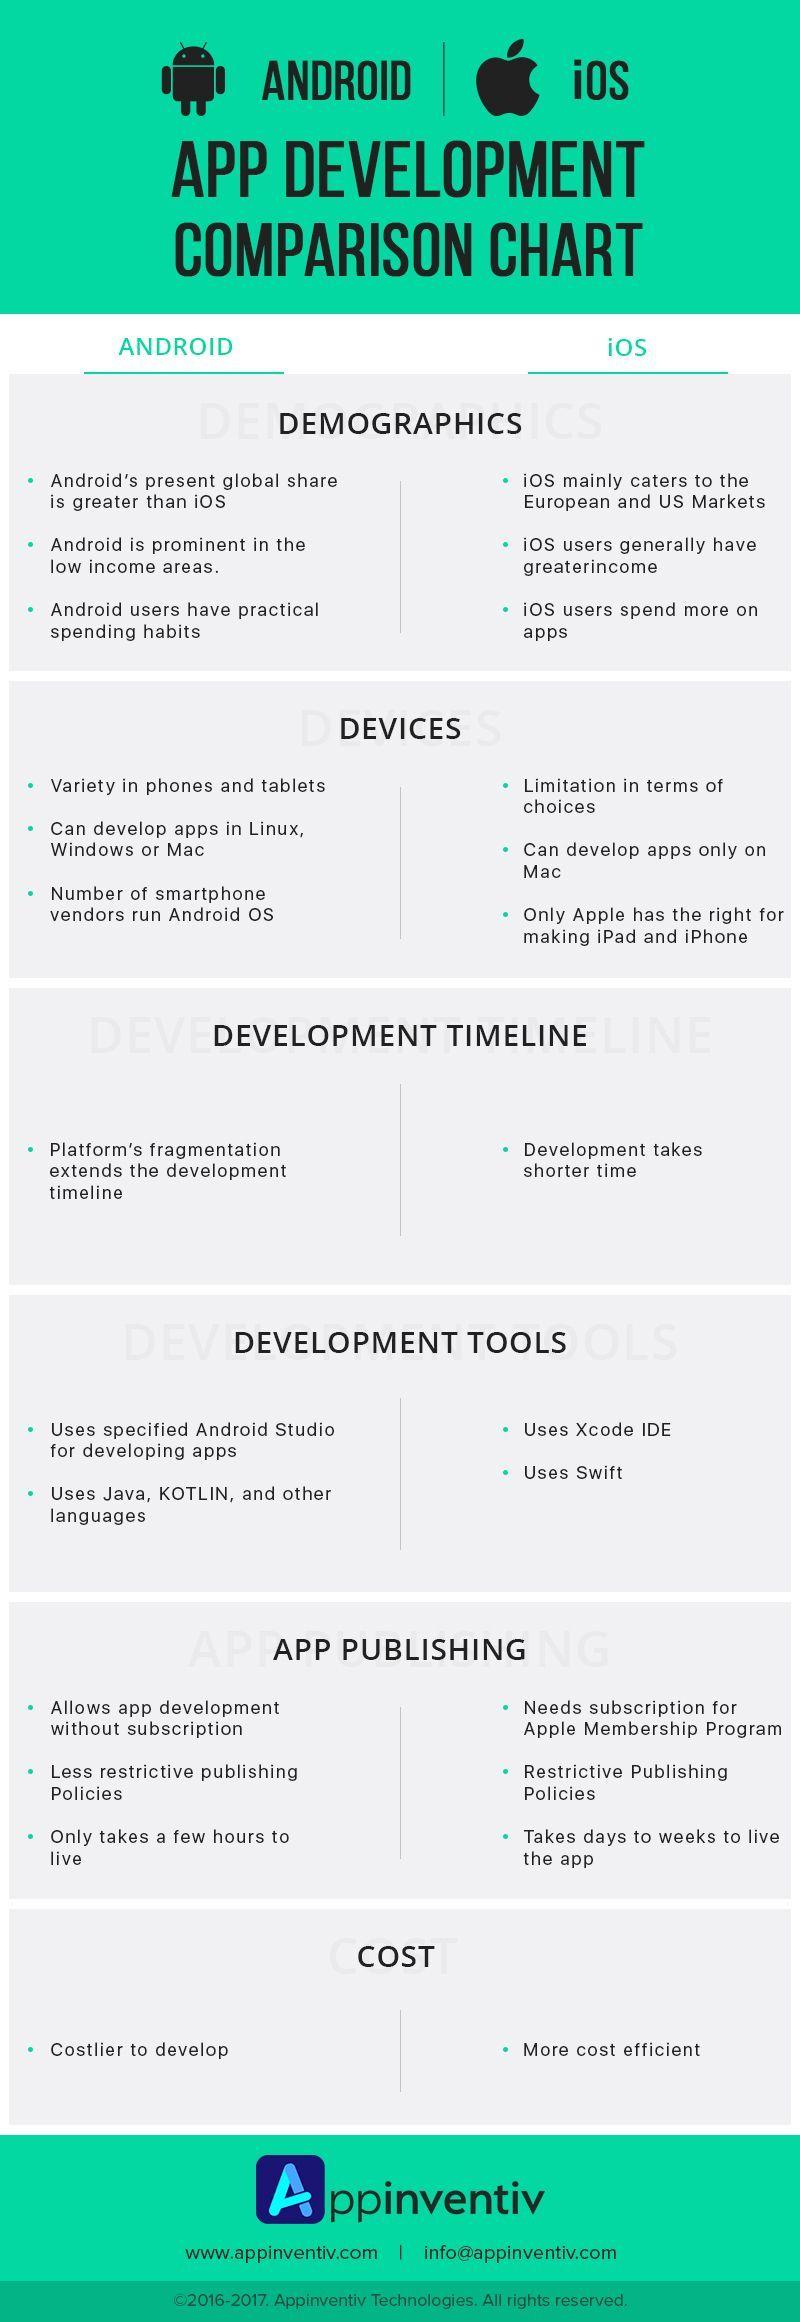 Android vs iOS App Development Comparison Chart. iOS